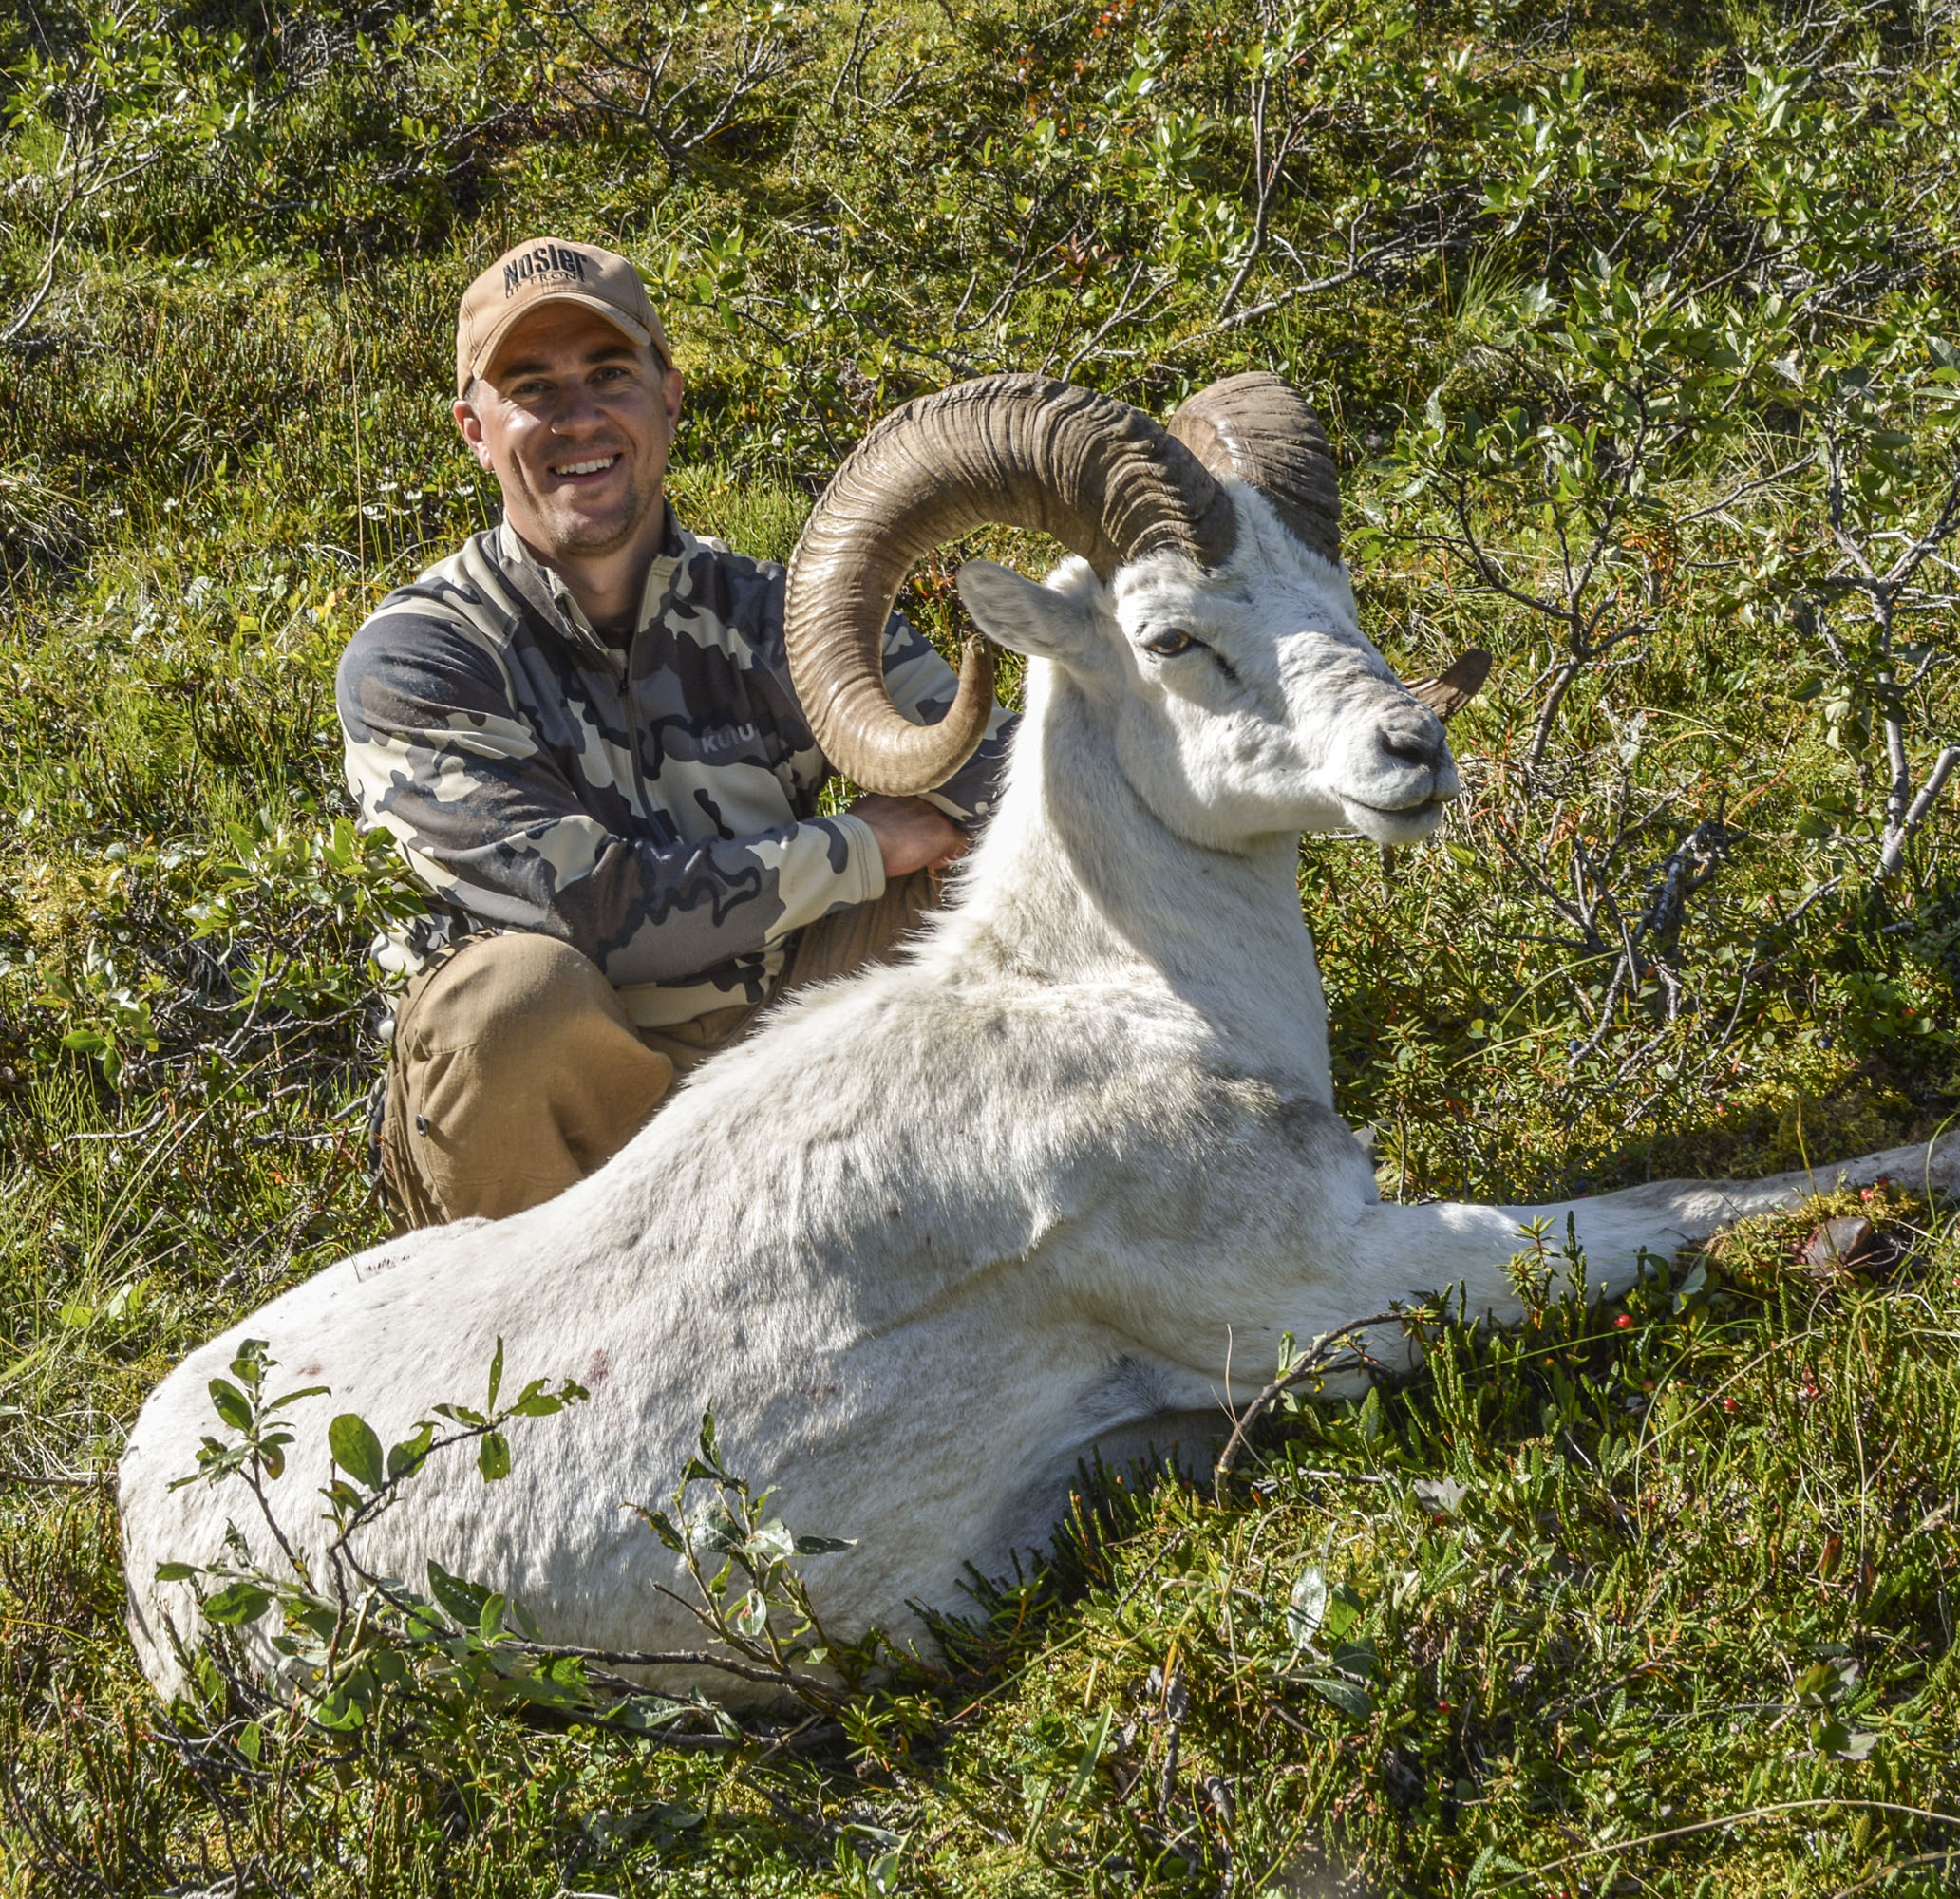 Sheep-JohnN-2016.jpg